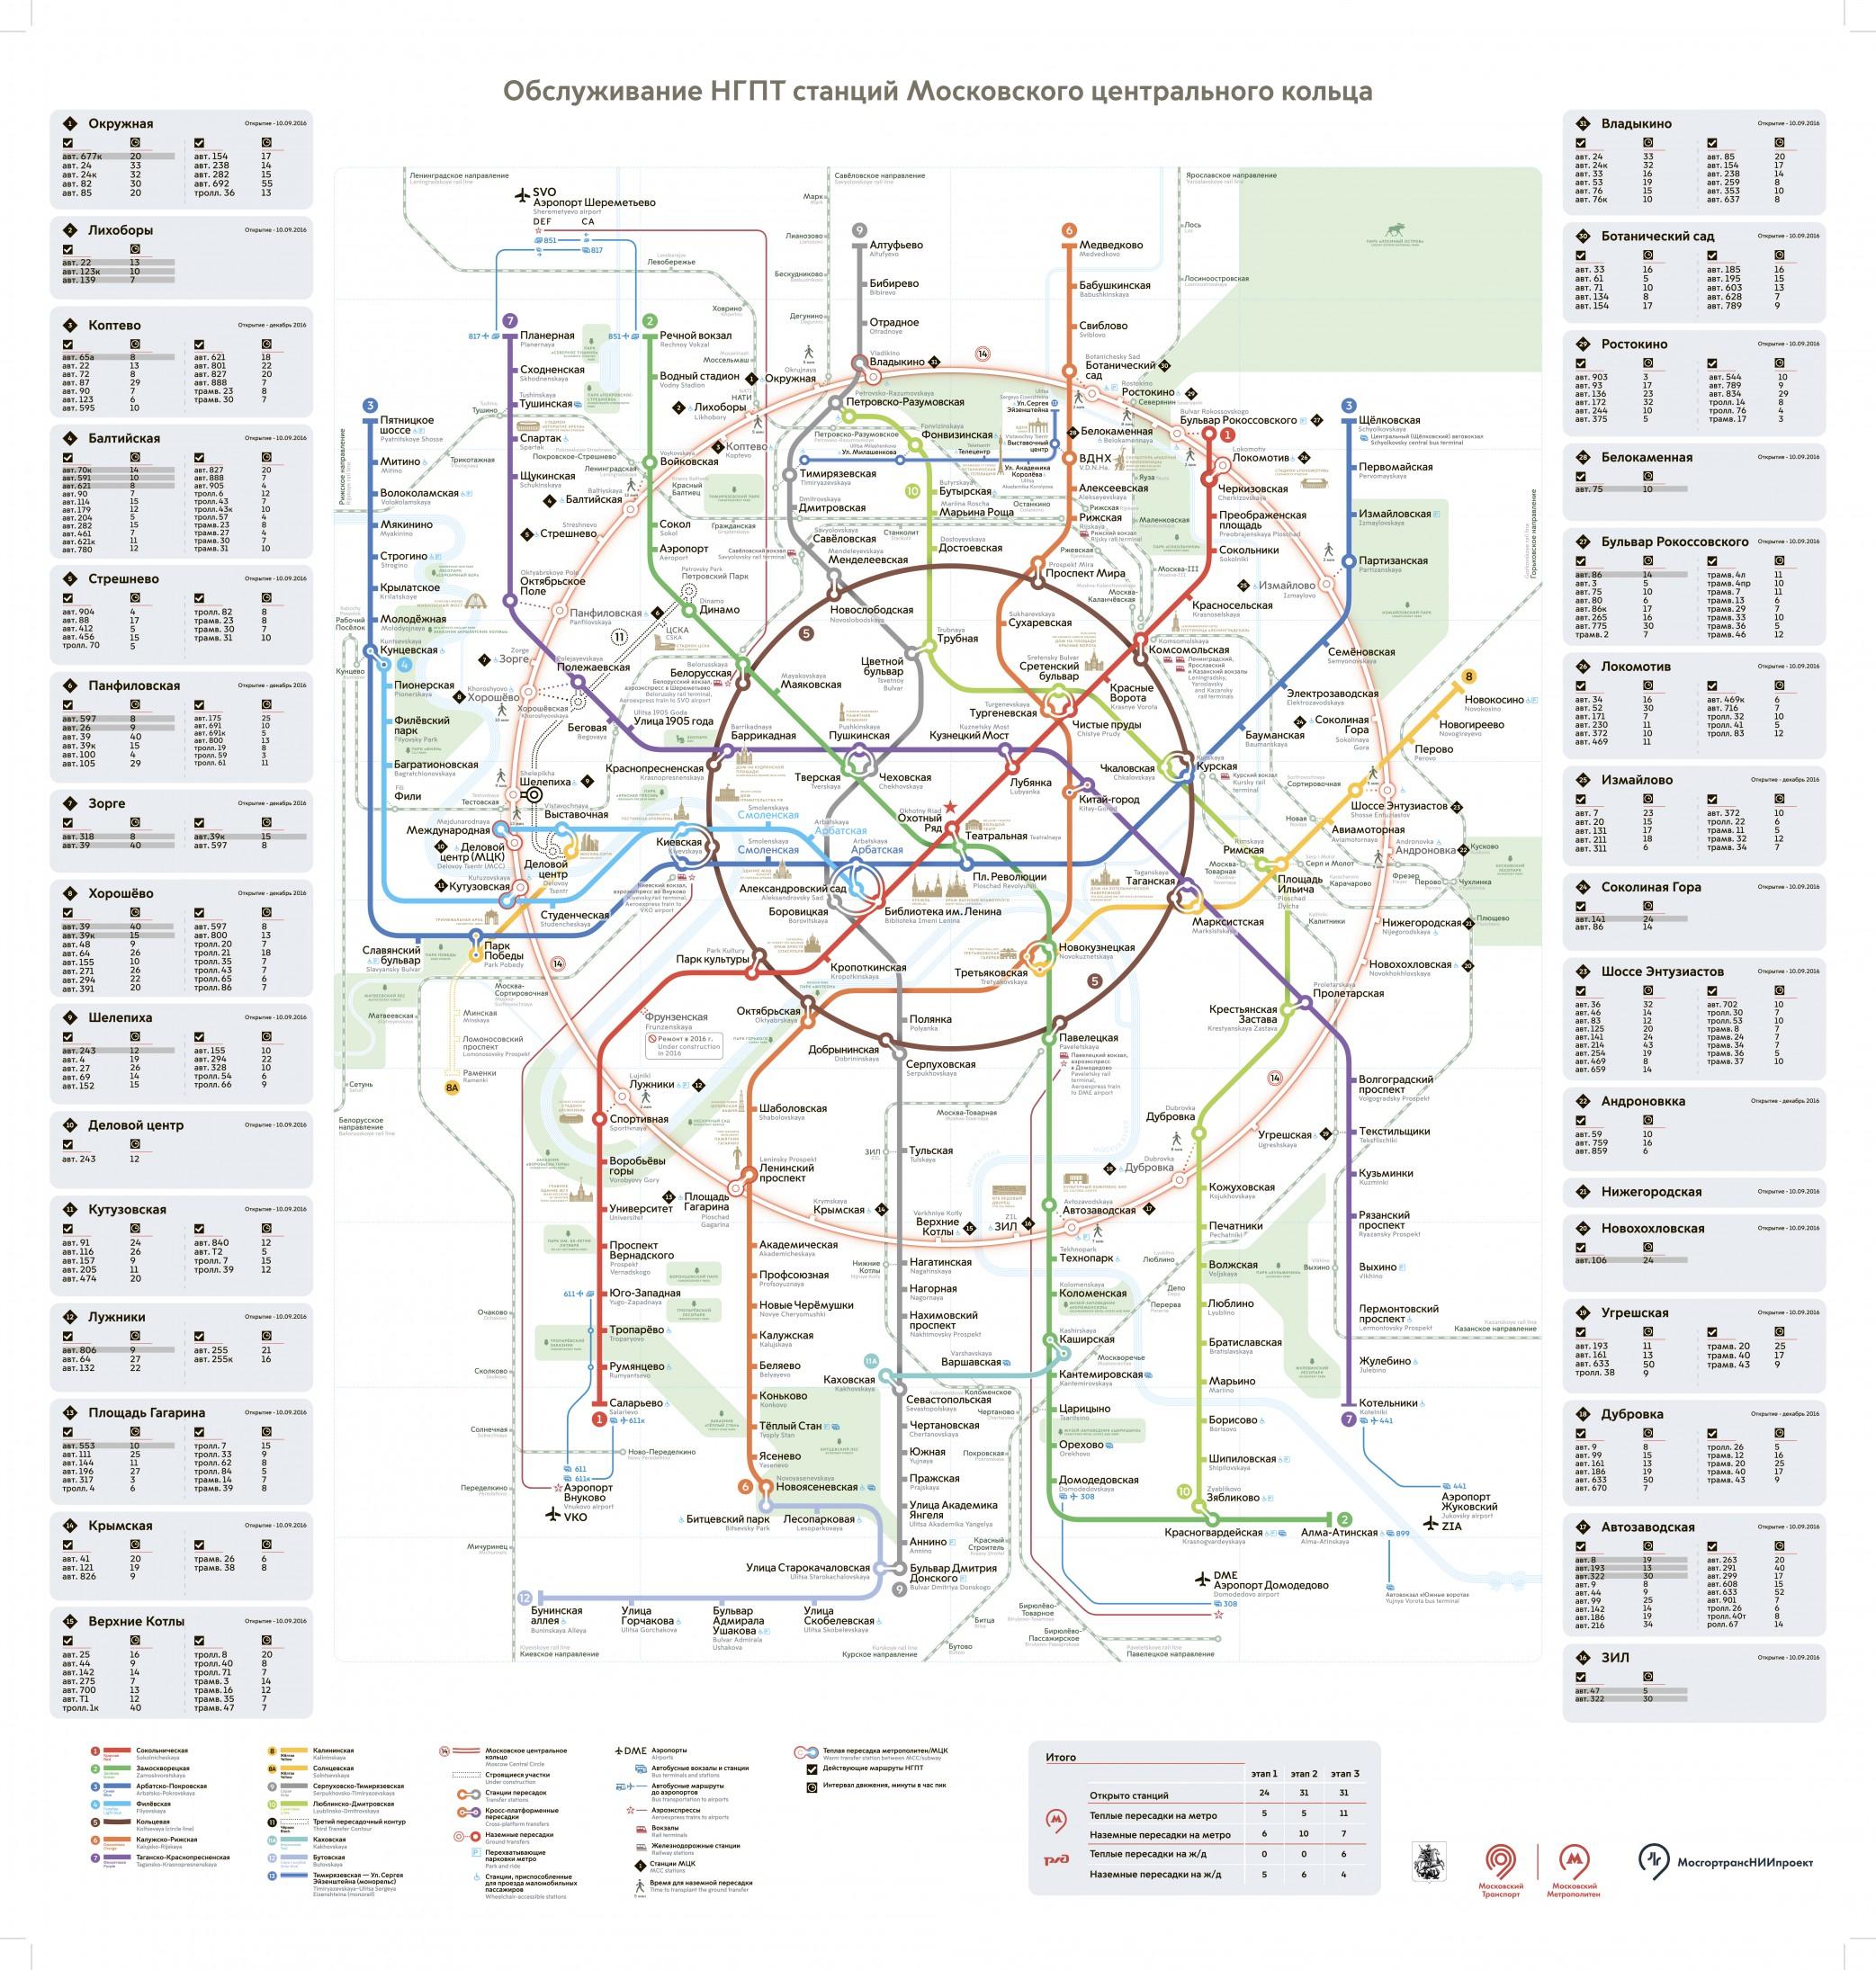 2012 схема московского метрополитена